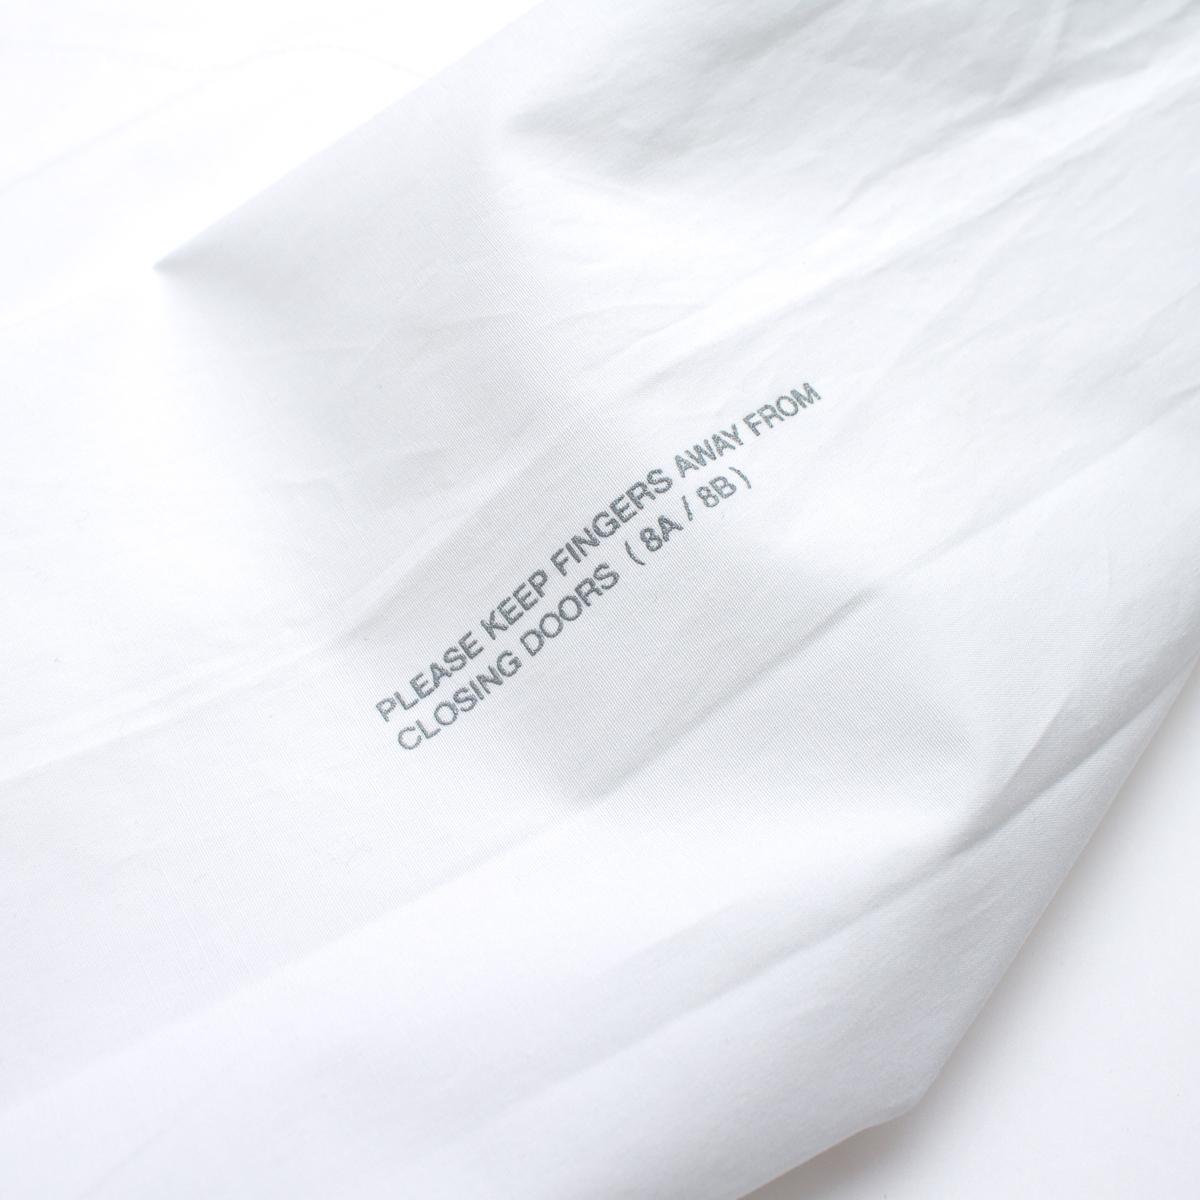 【BURNER×THE STRAIT】ポプリンノーカラーリフレクターシャツブルゾン #WHITE